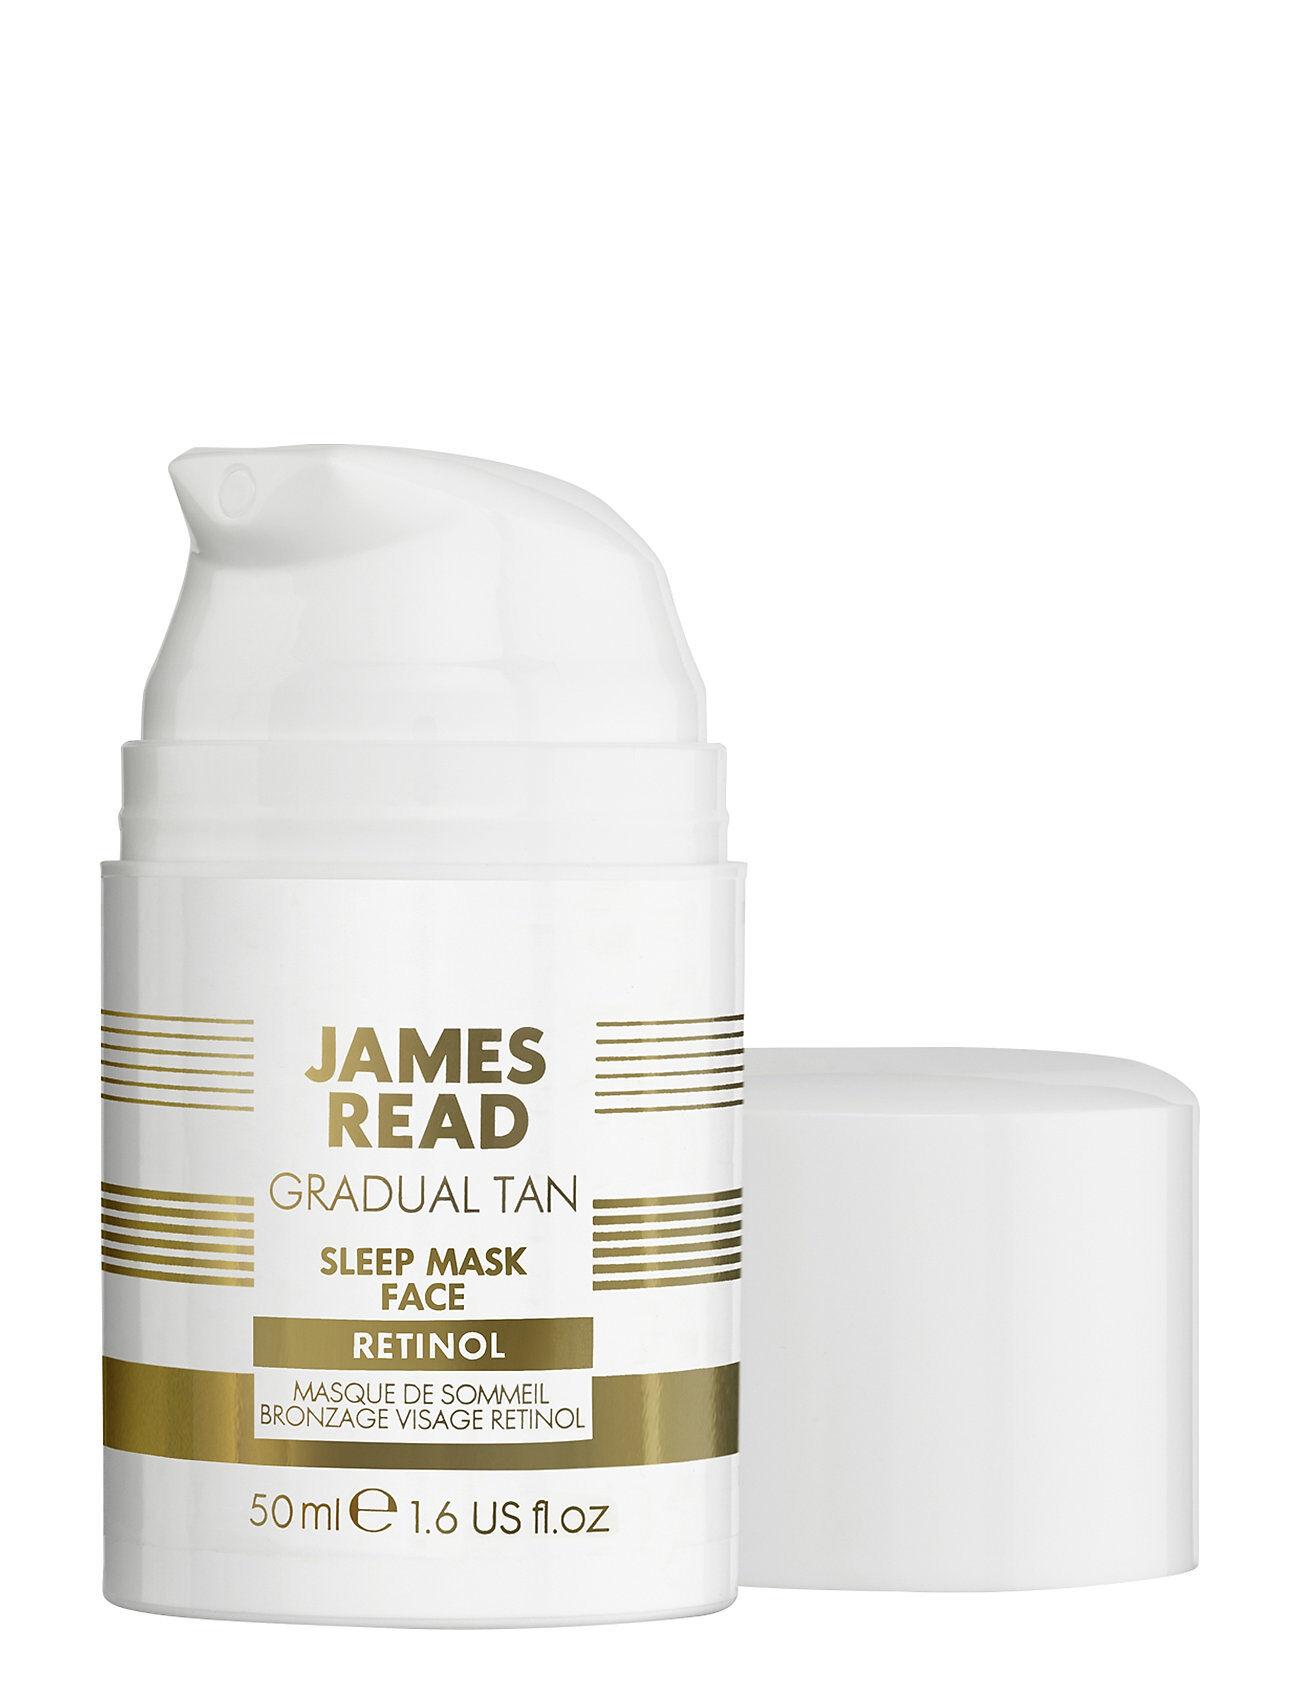 James Read Sleep Mask Tan Retinol Beauty WOMEN Skin Care Sun Products Self Tanners Nude James Read